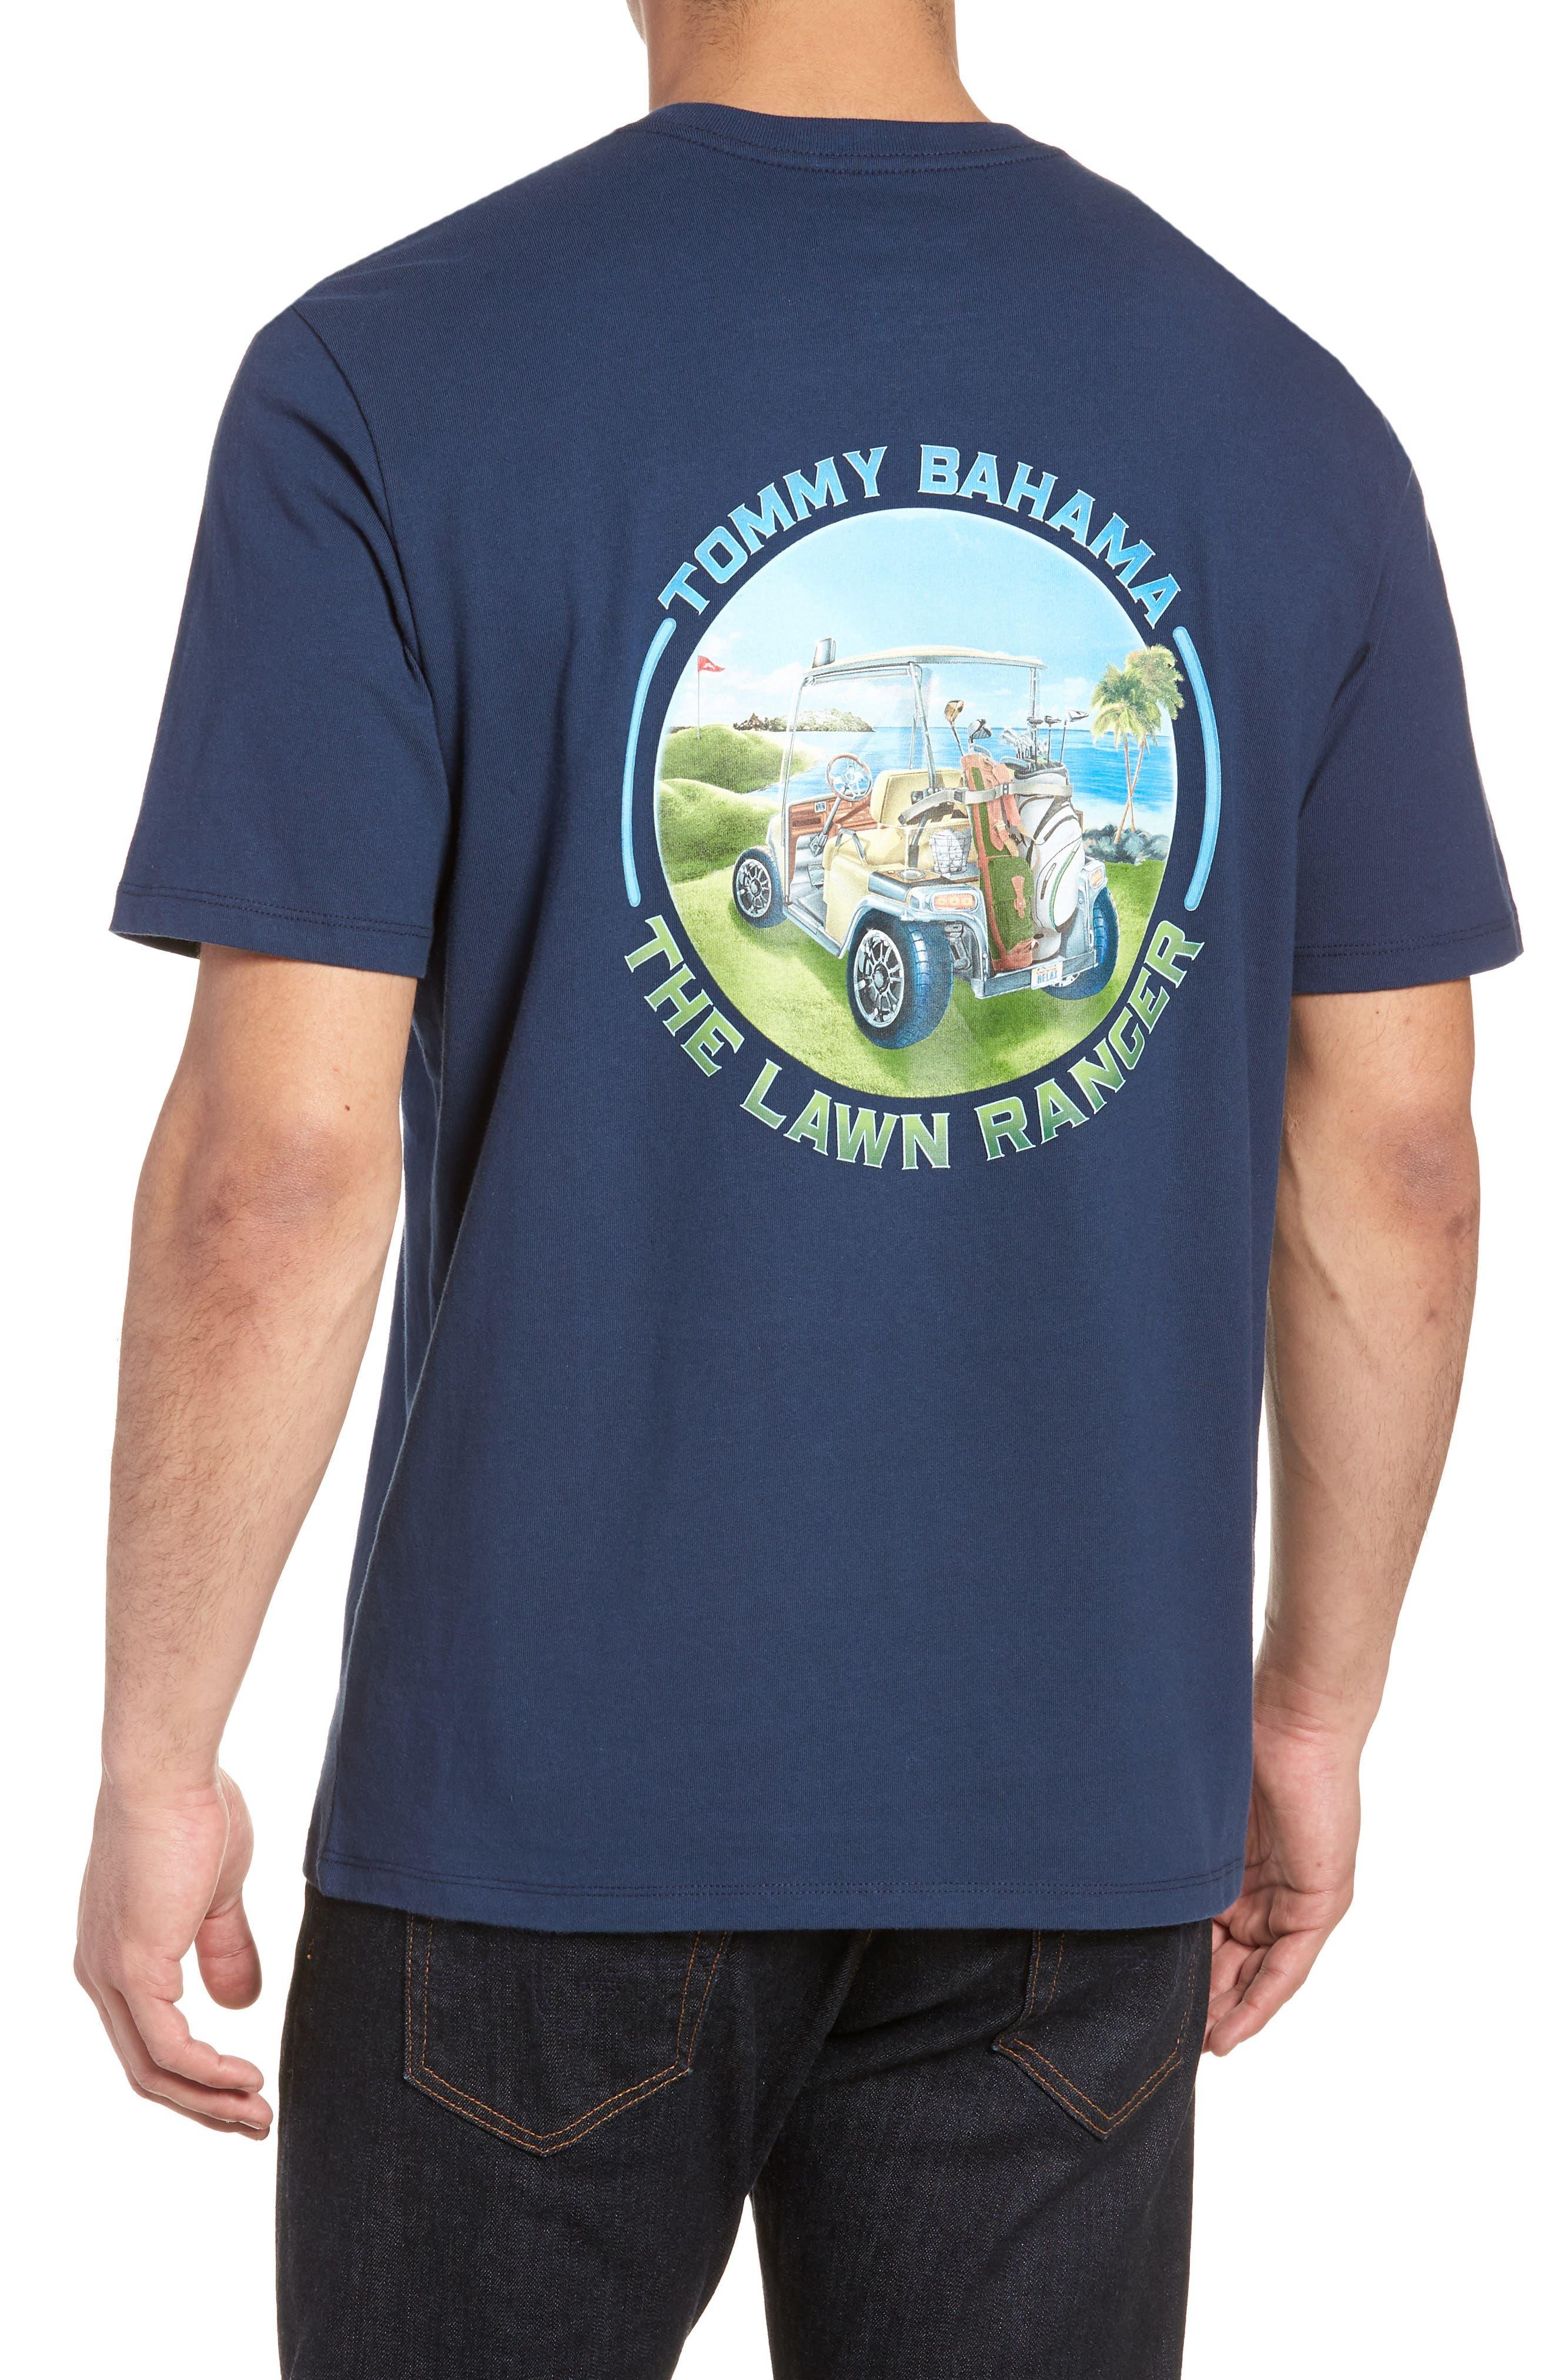 TOMMY BAHAMA,                             The Lawn Ranger T-Shirt,                             Alternate thumbnail 2, color,                             400